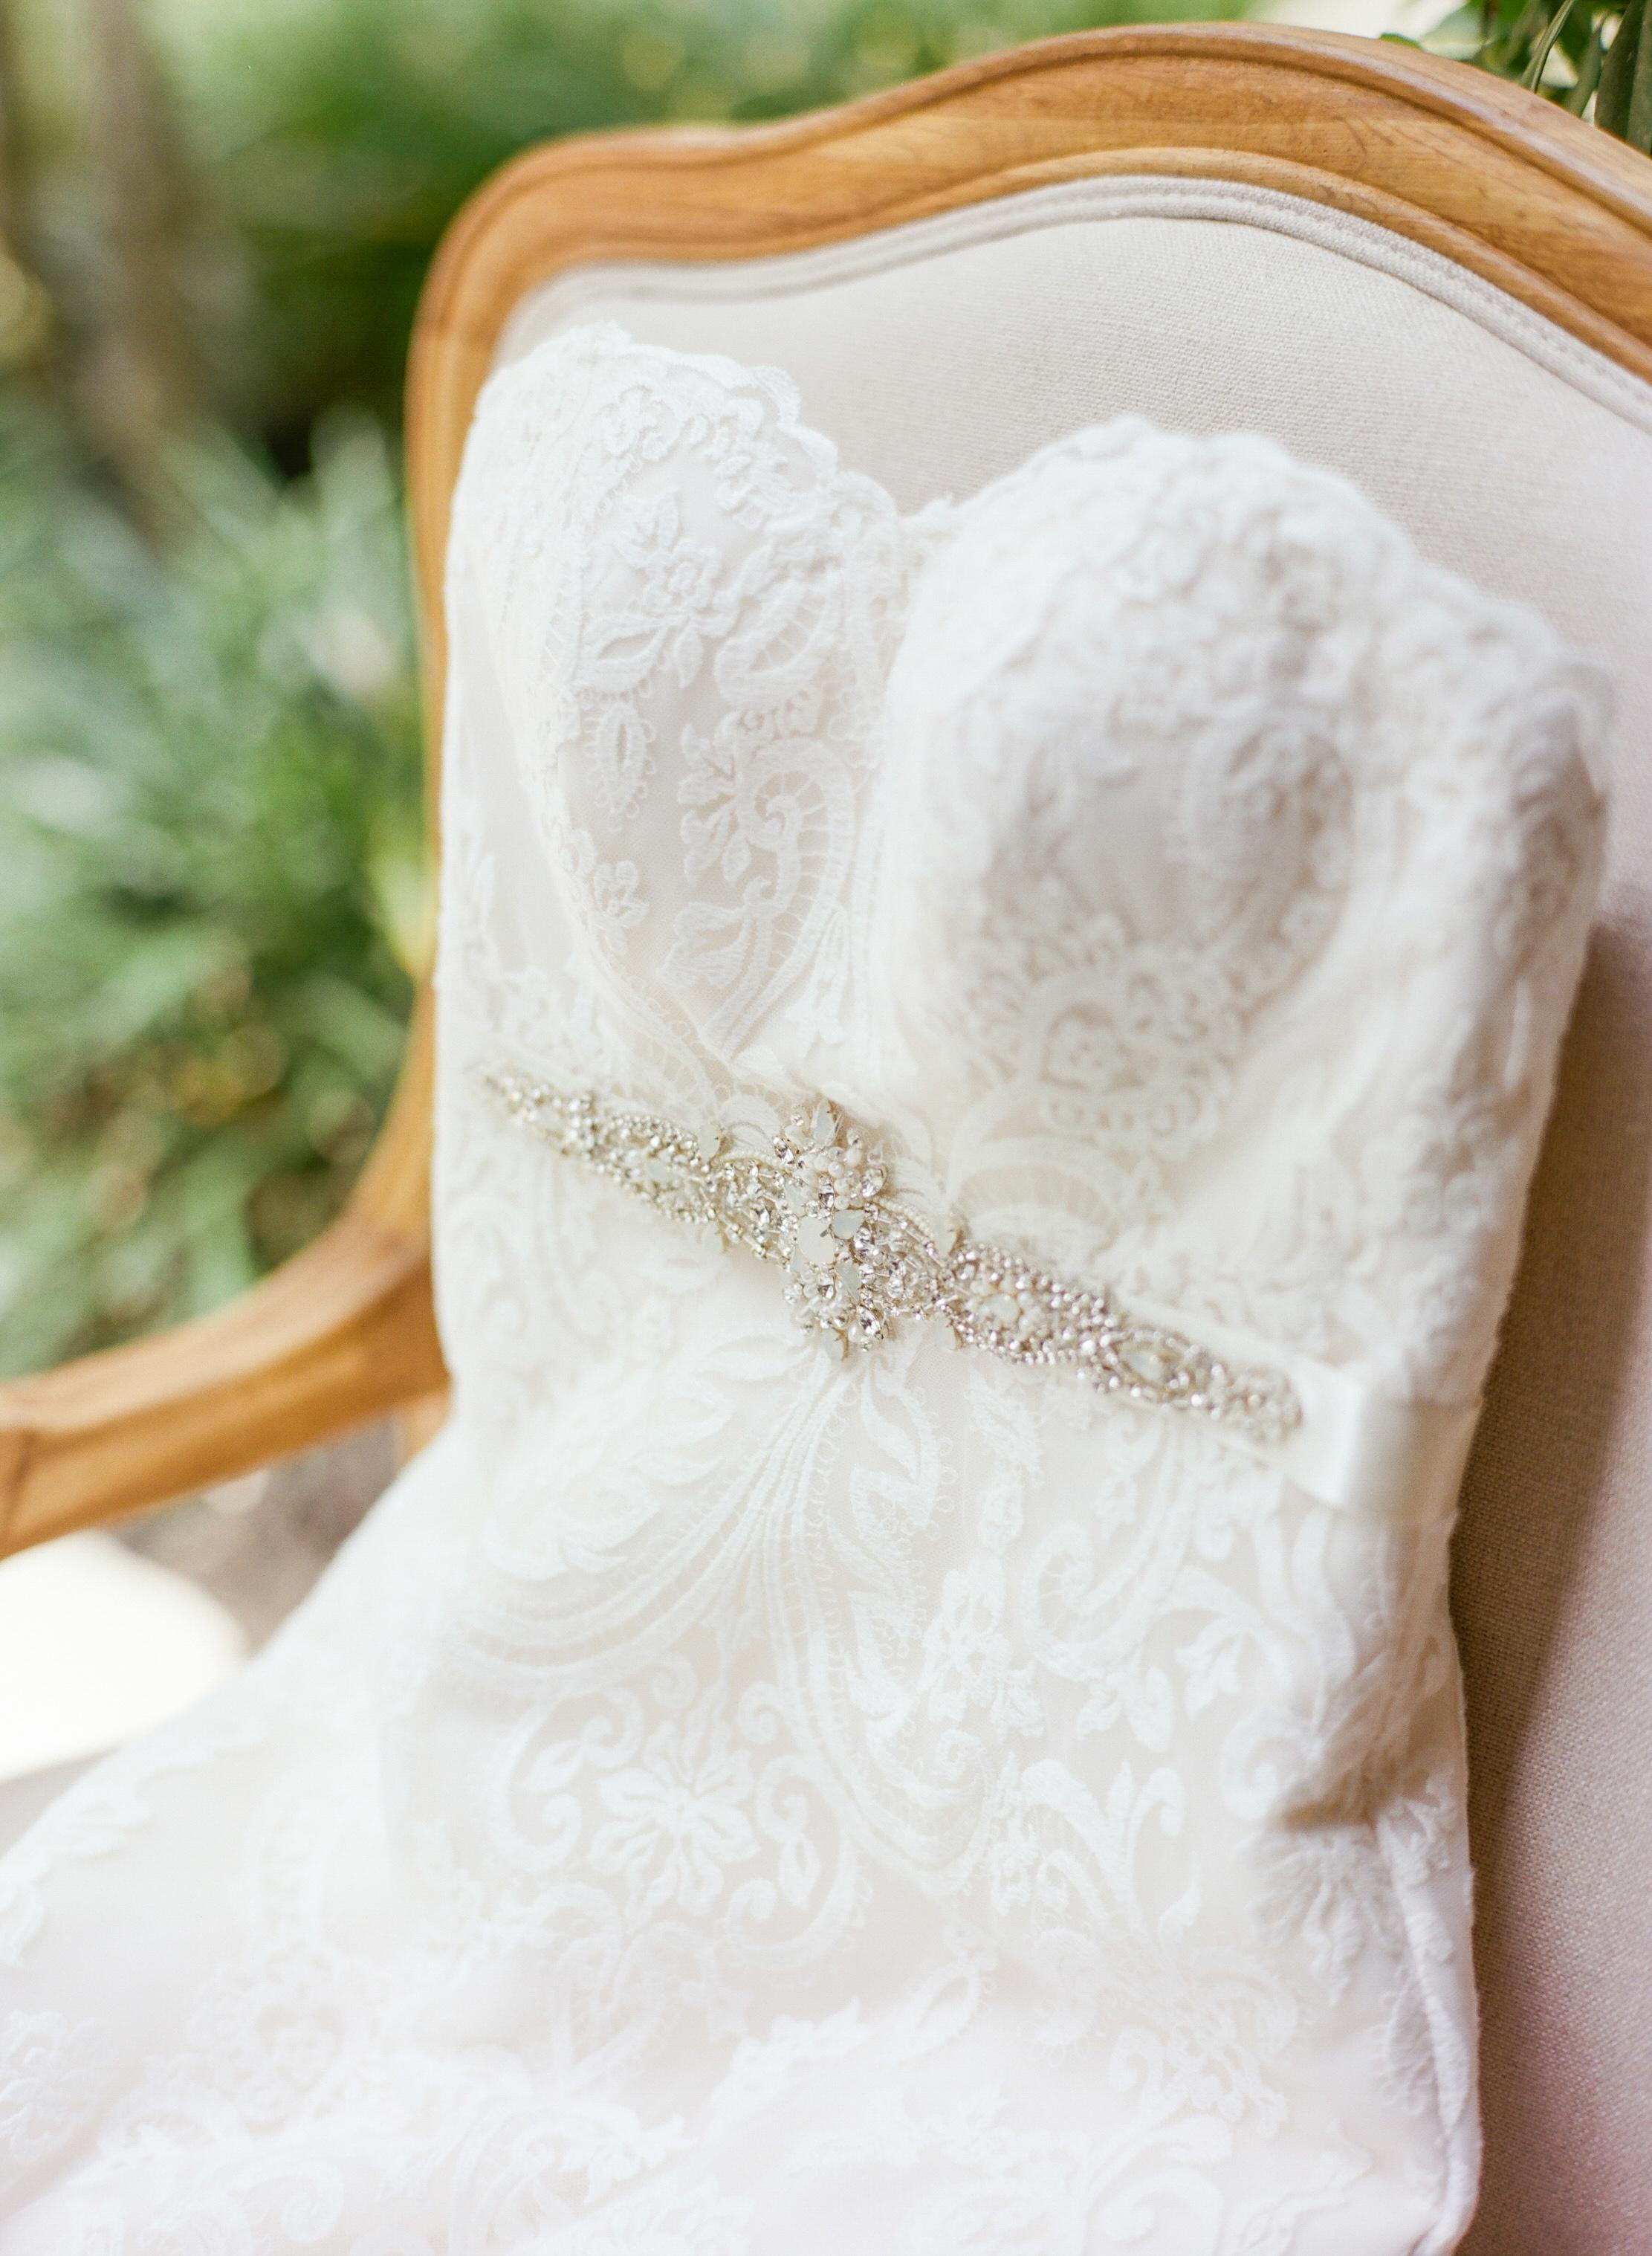 The-Knot-Wedding-Houston-Photographer-Fine-Art-Dana-Fernandez-Photography-Film-2.jpg